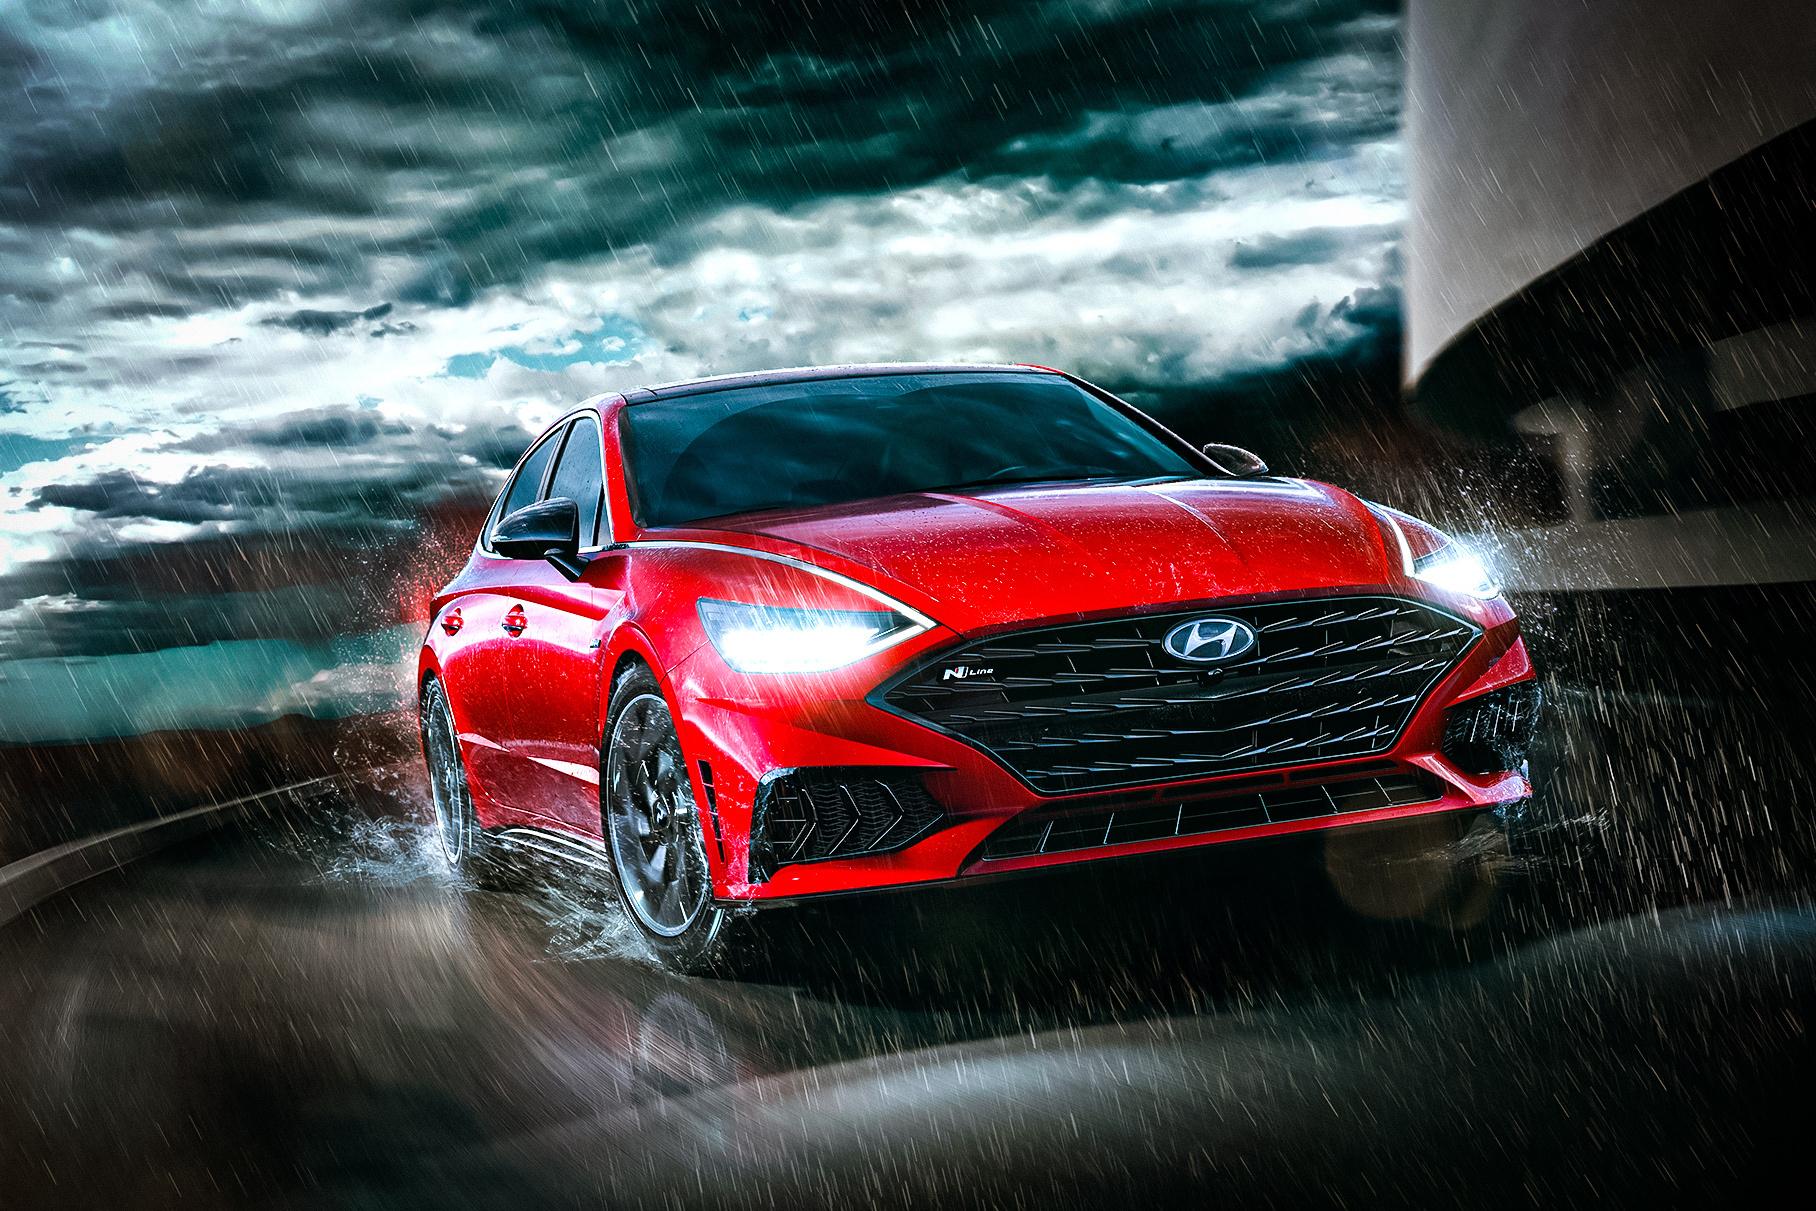 Представлена самая мощная Hyundai Sonata